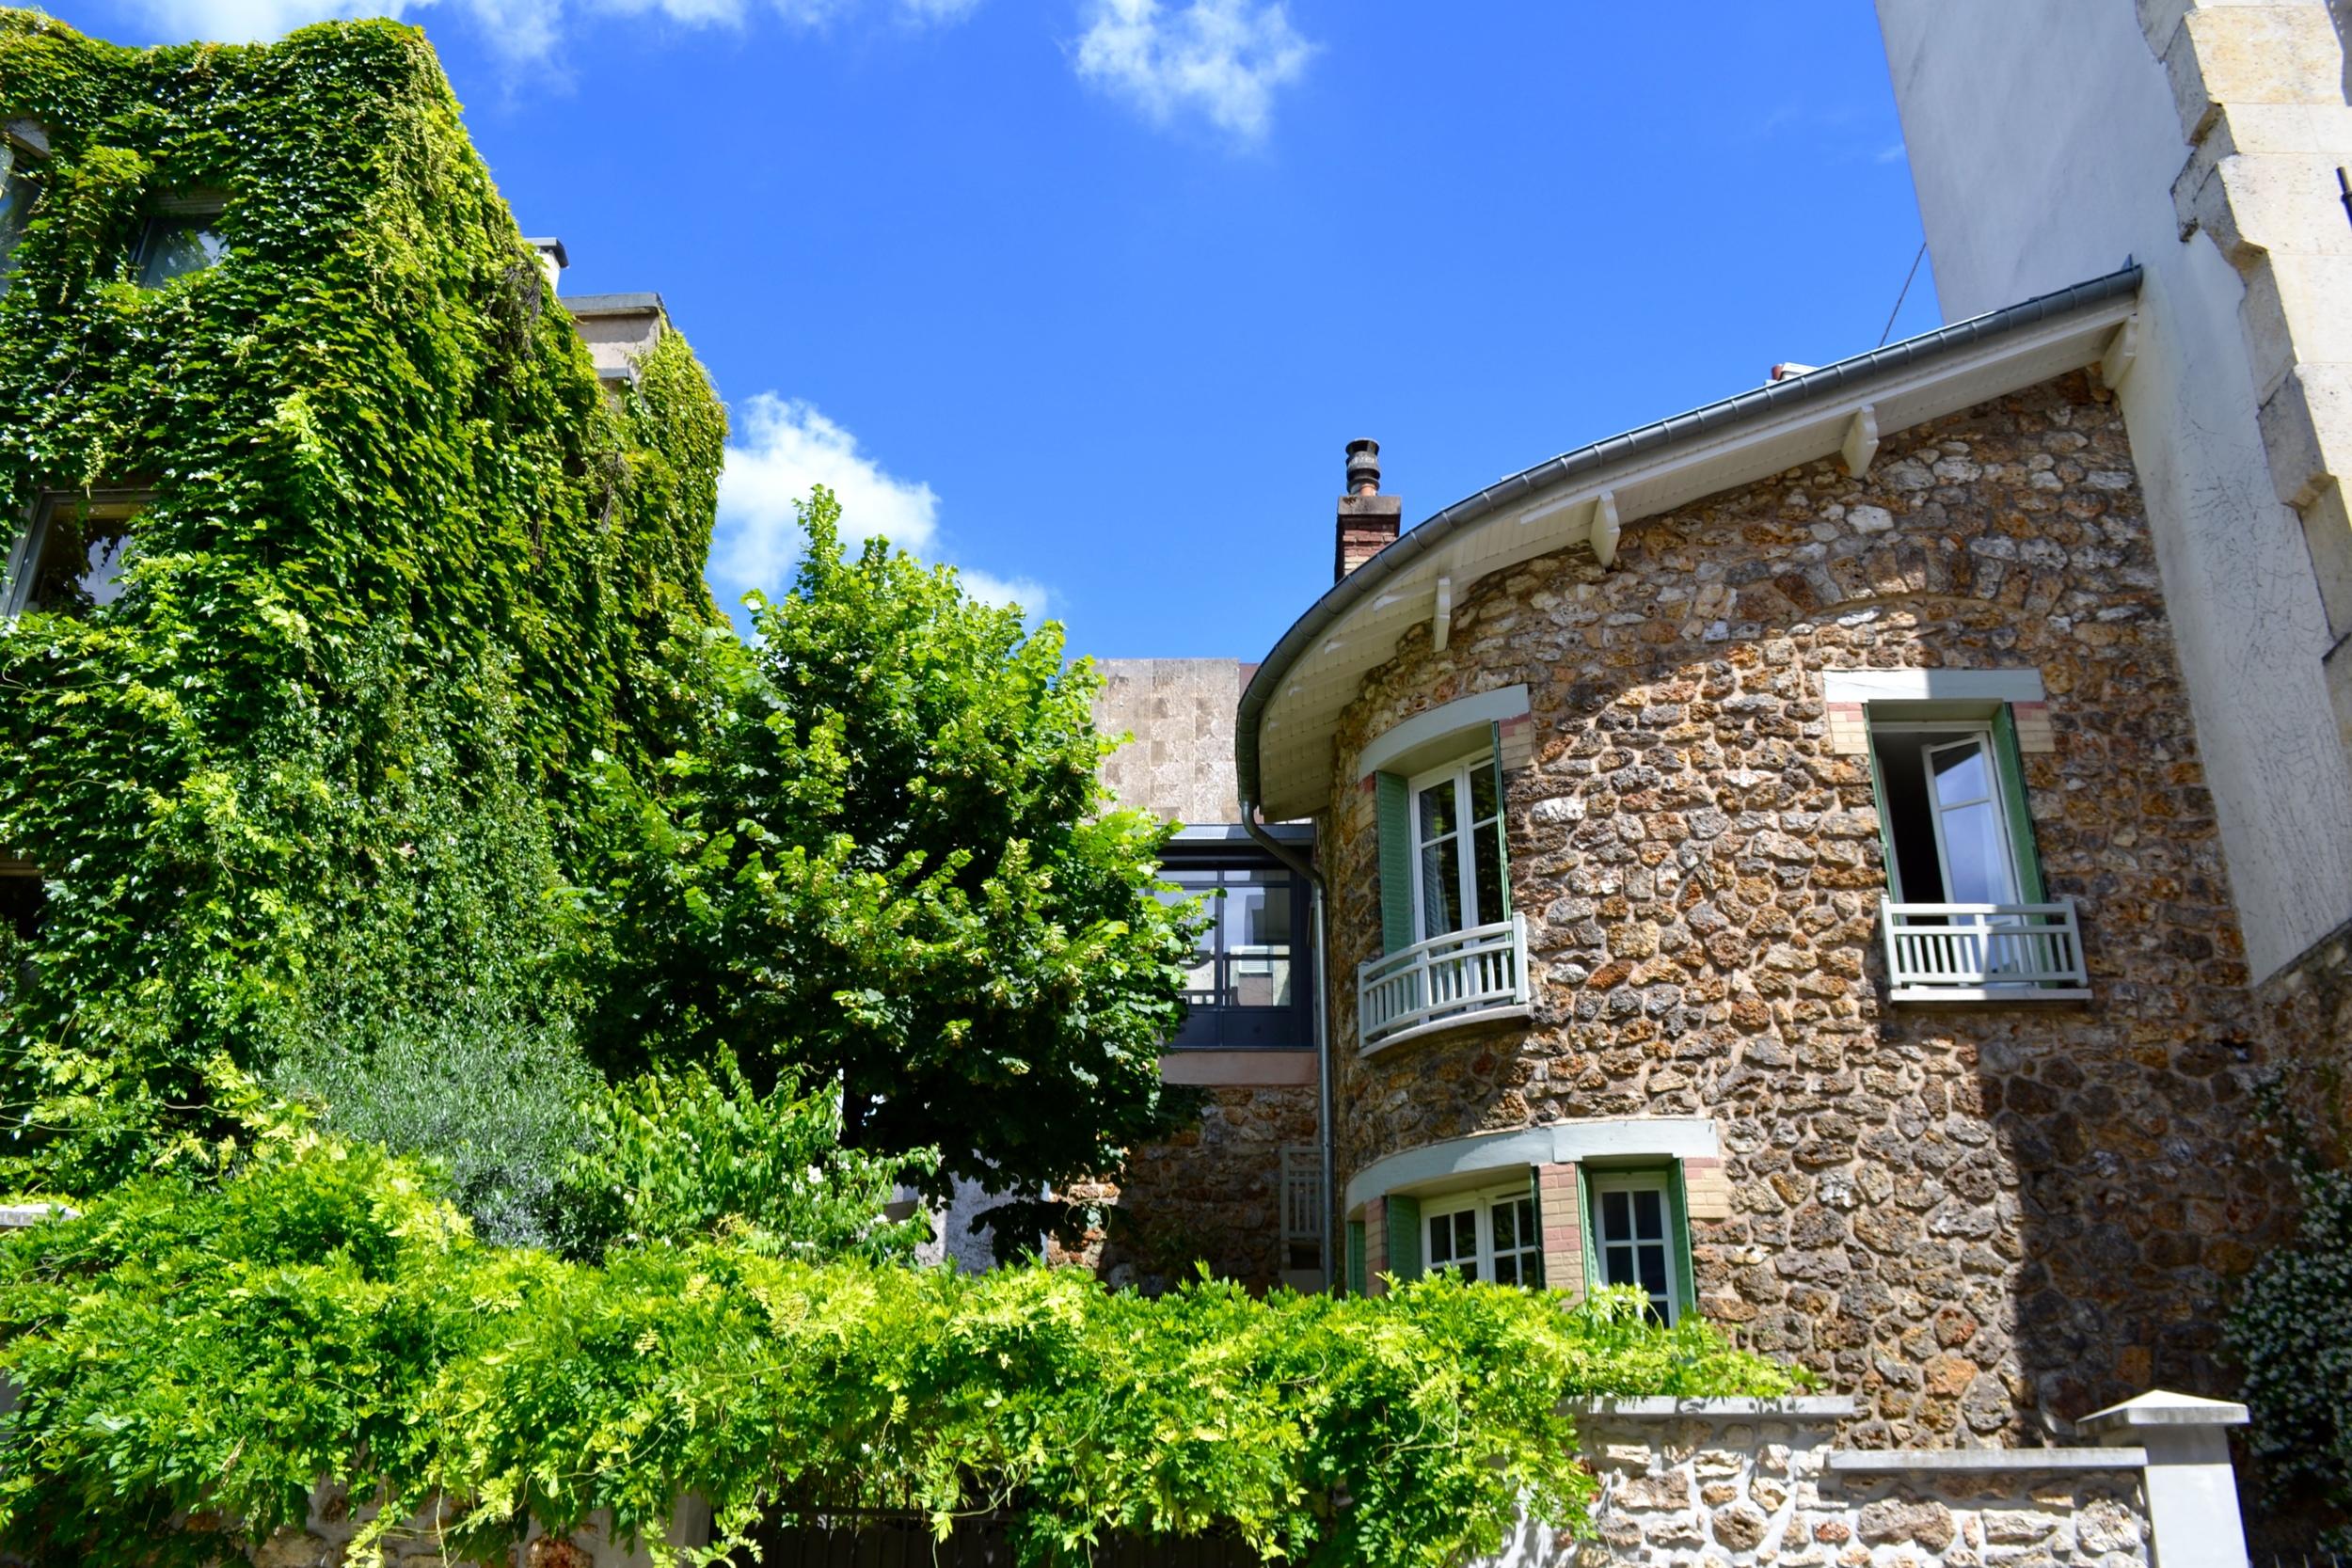 A mix of old and new on the rue du Parc de Montsouris